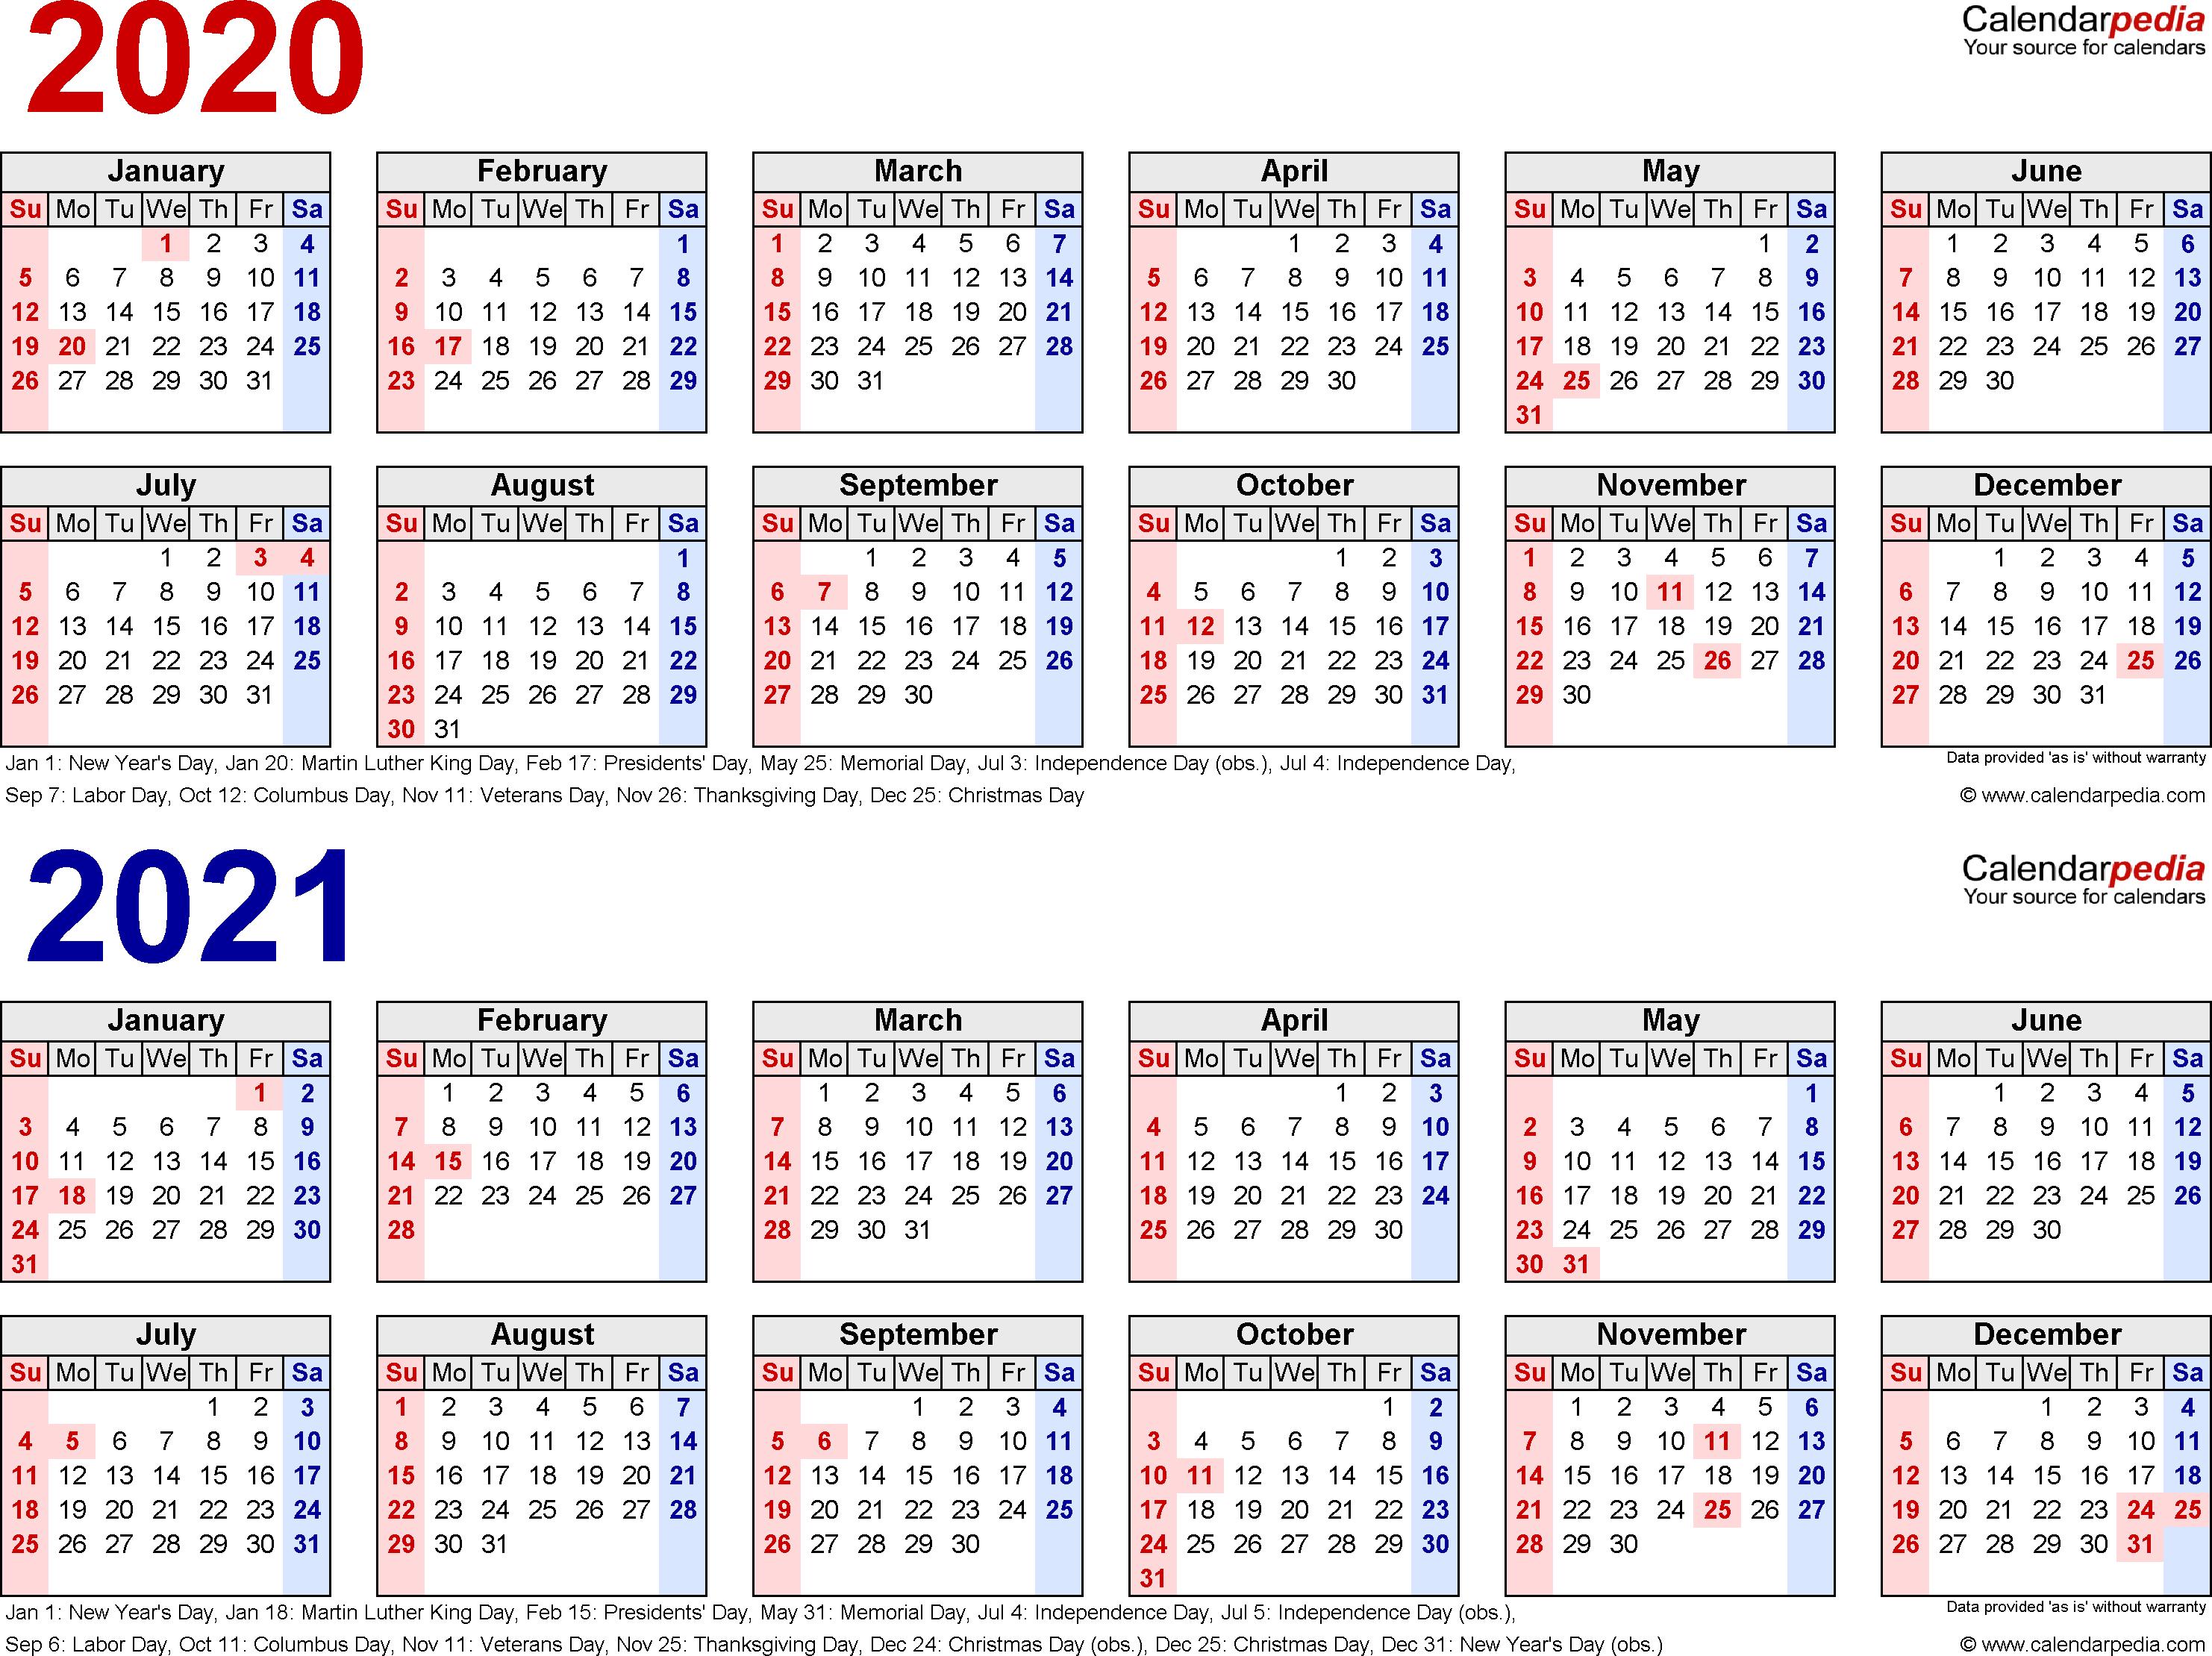 2020-2021 Calendar - Free Printable Two-Year Word Calendars